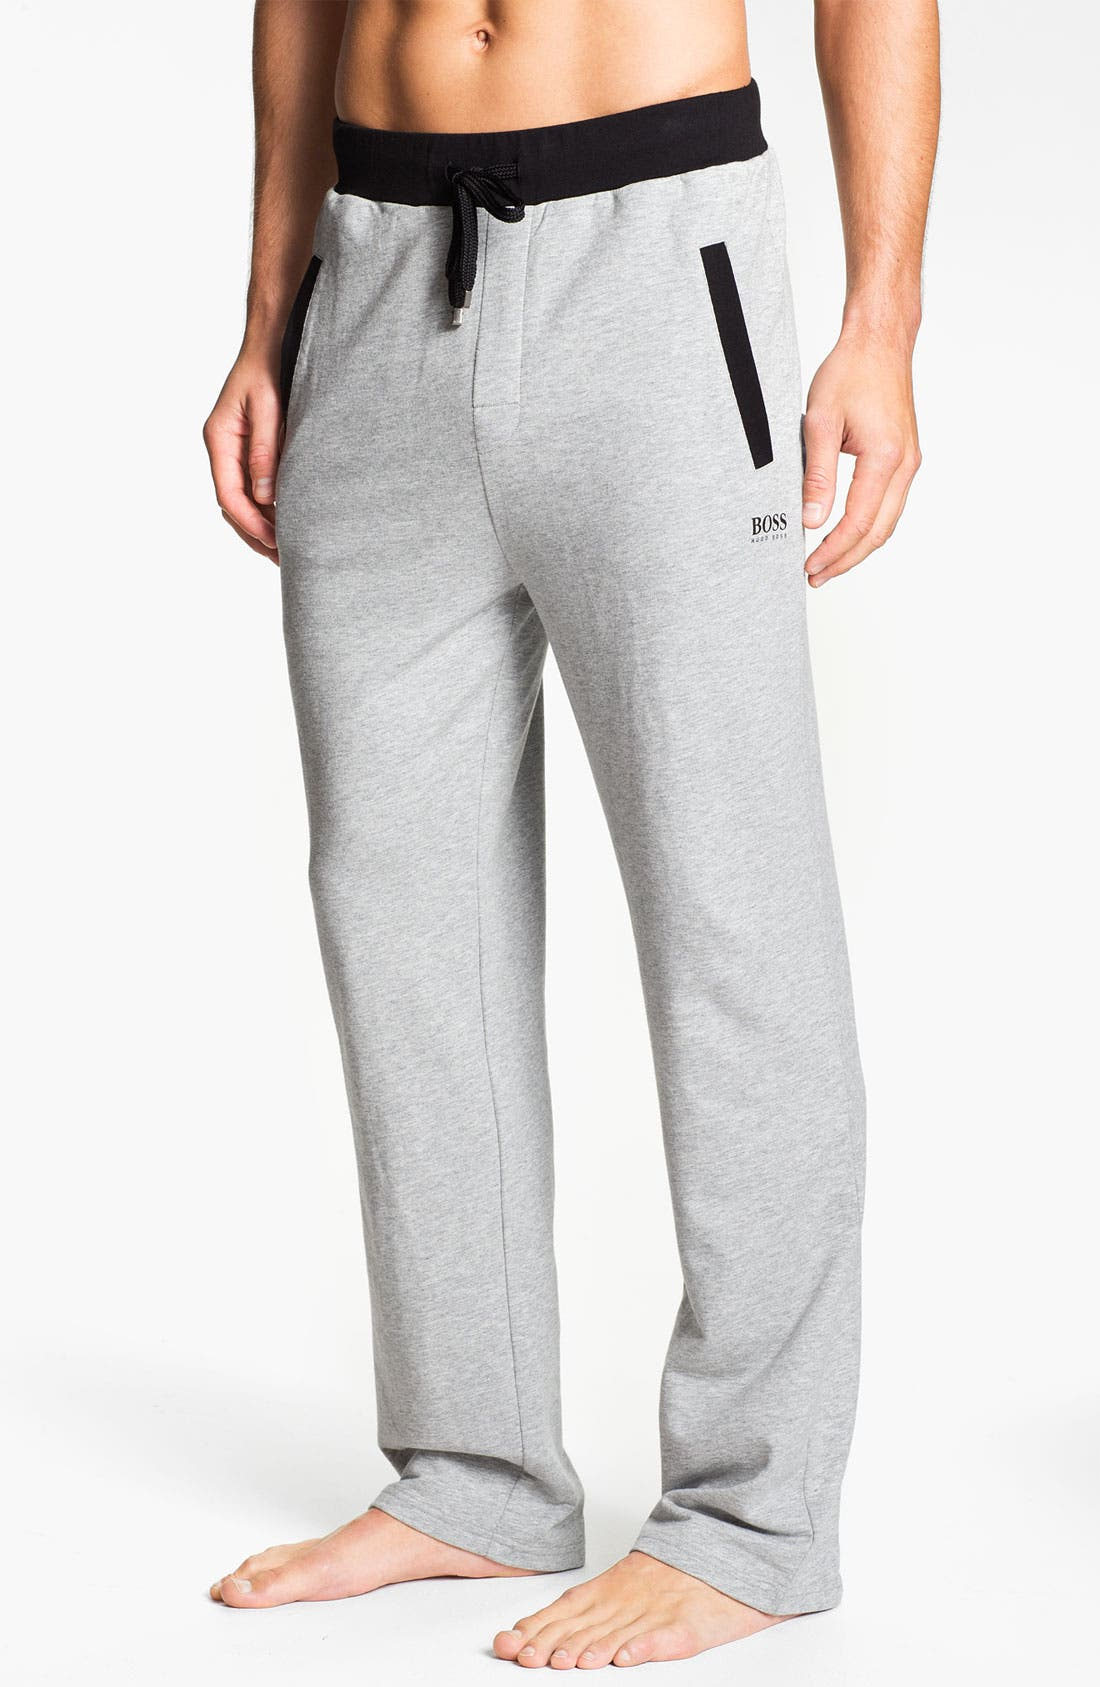 Main Image - BOSS Black 'Innovation 4' Lounge Pants